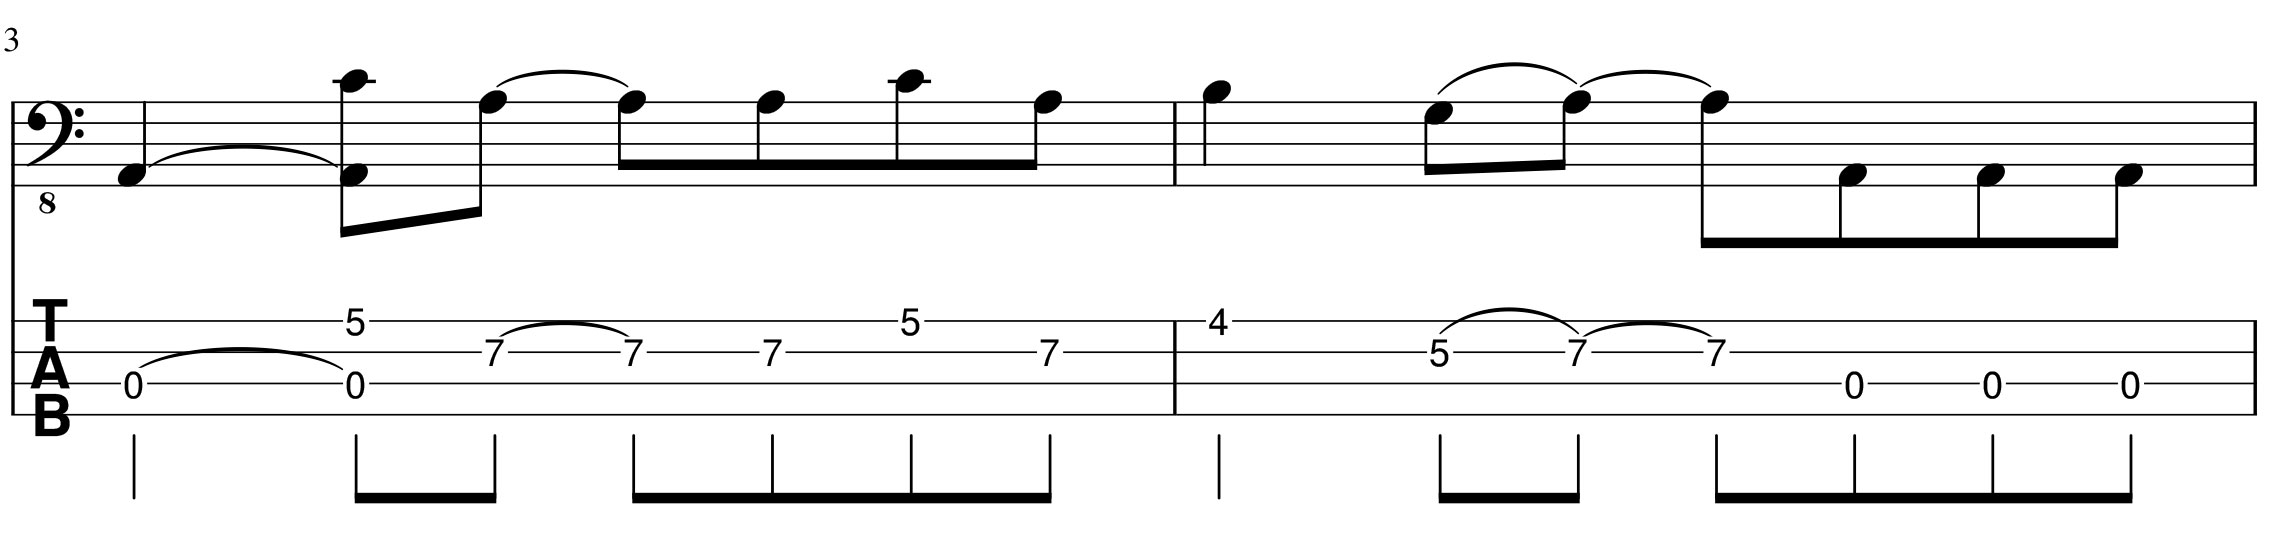 Bass-lernen-für-Anfänger-Bassline-2_2